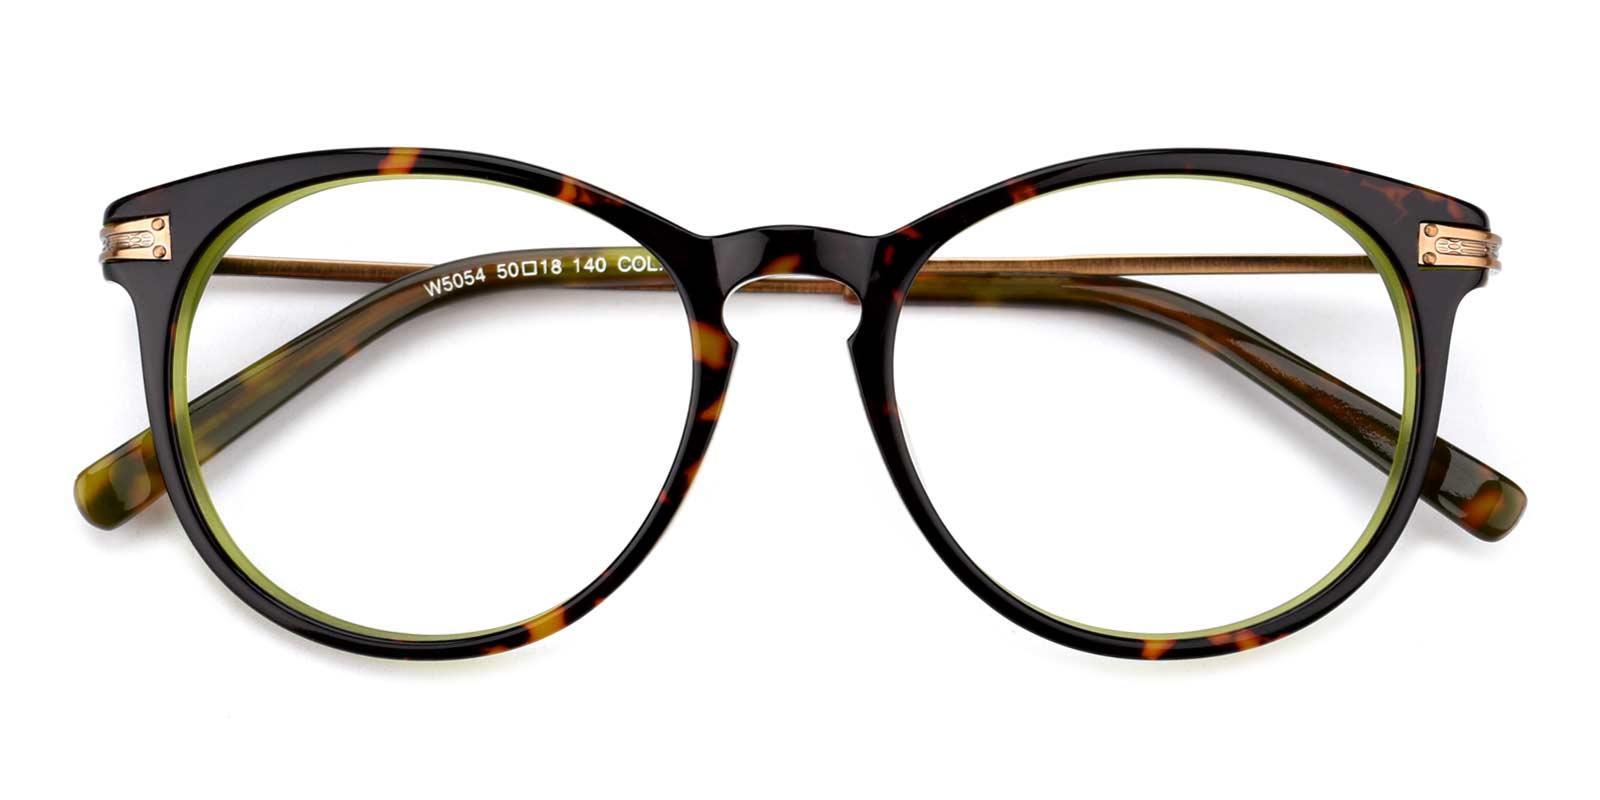 Condiments-Multicolor-Round-TR-Eyeglasses-detail